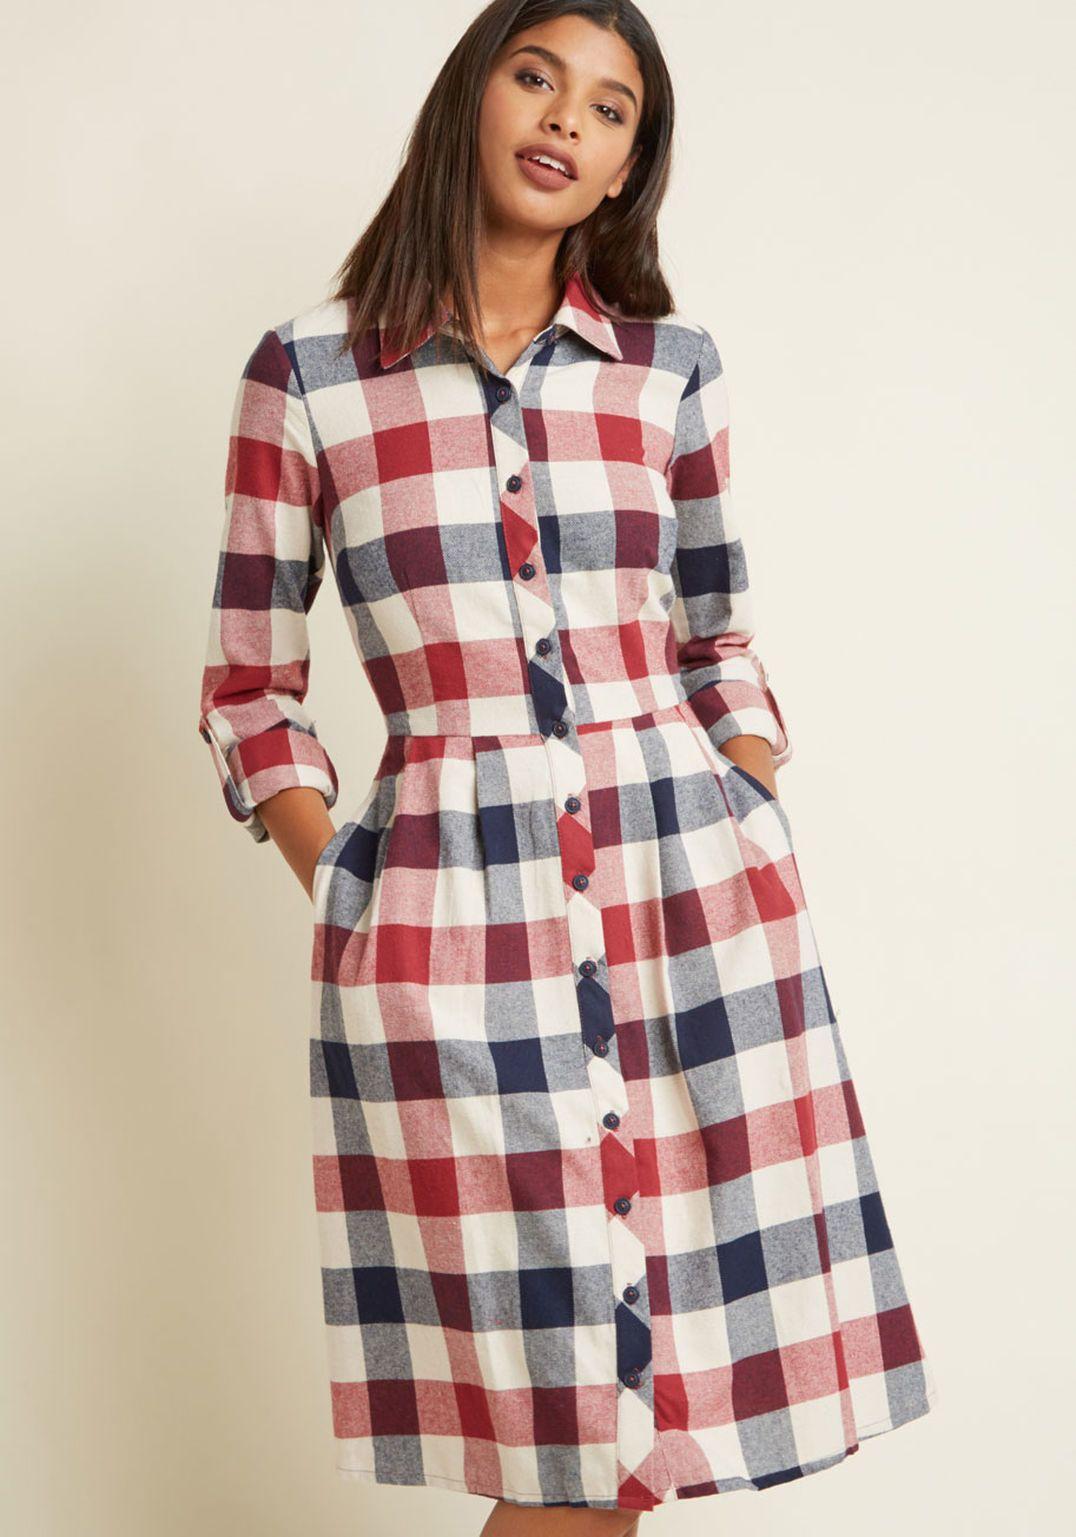 32d00eb5c5 Jam, Girl Shirt Dress in Mixed Berry Vestido Xadrez, Vestido Chique, Vestido  Godê